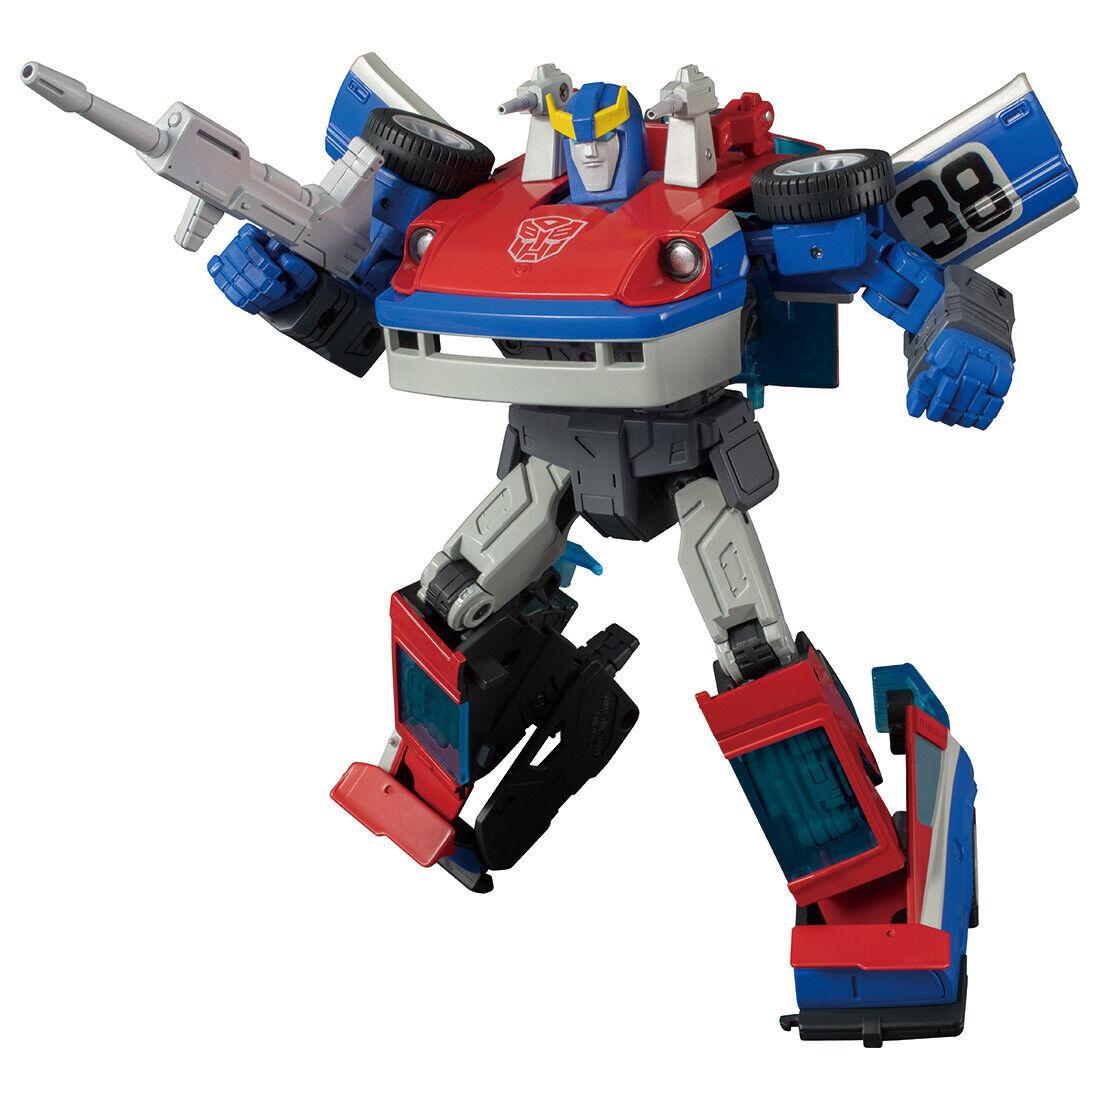 Takara Tomy Transformers Masterpiece MP-19+ Smokescreen Japan version